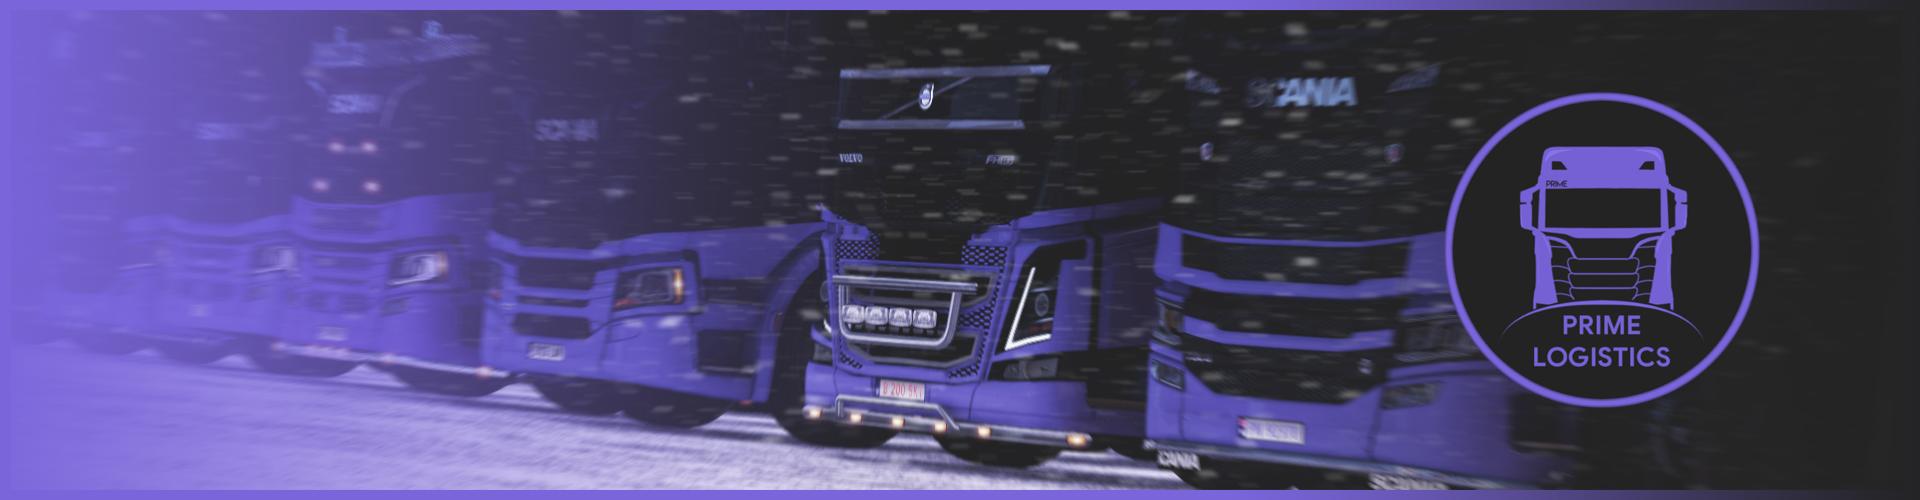 🟣 Prime Logistics Convoy #71